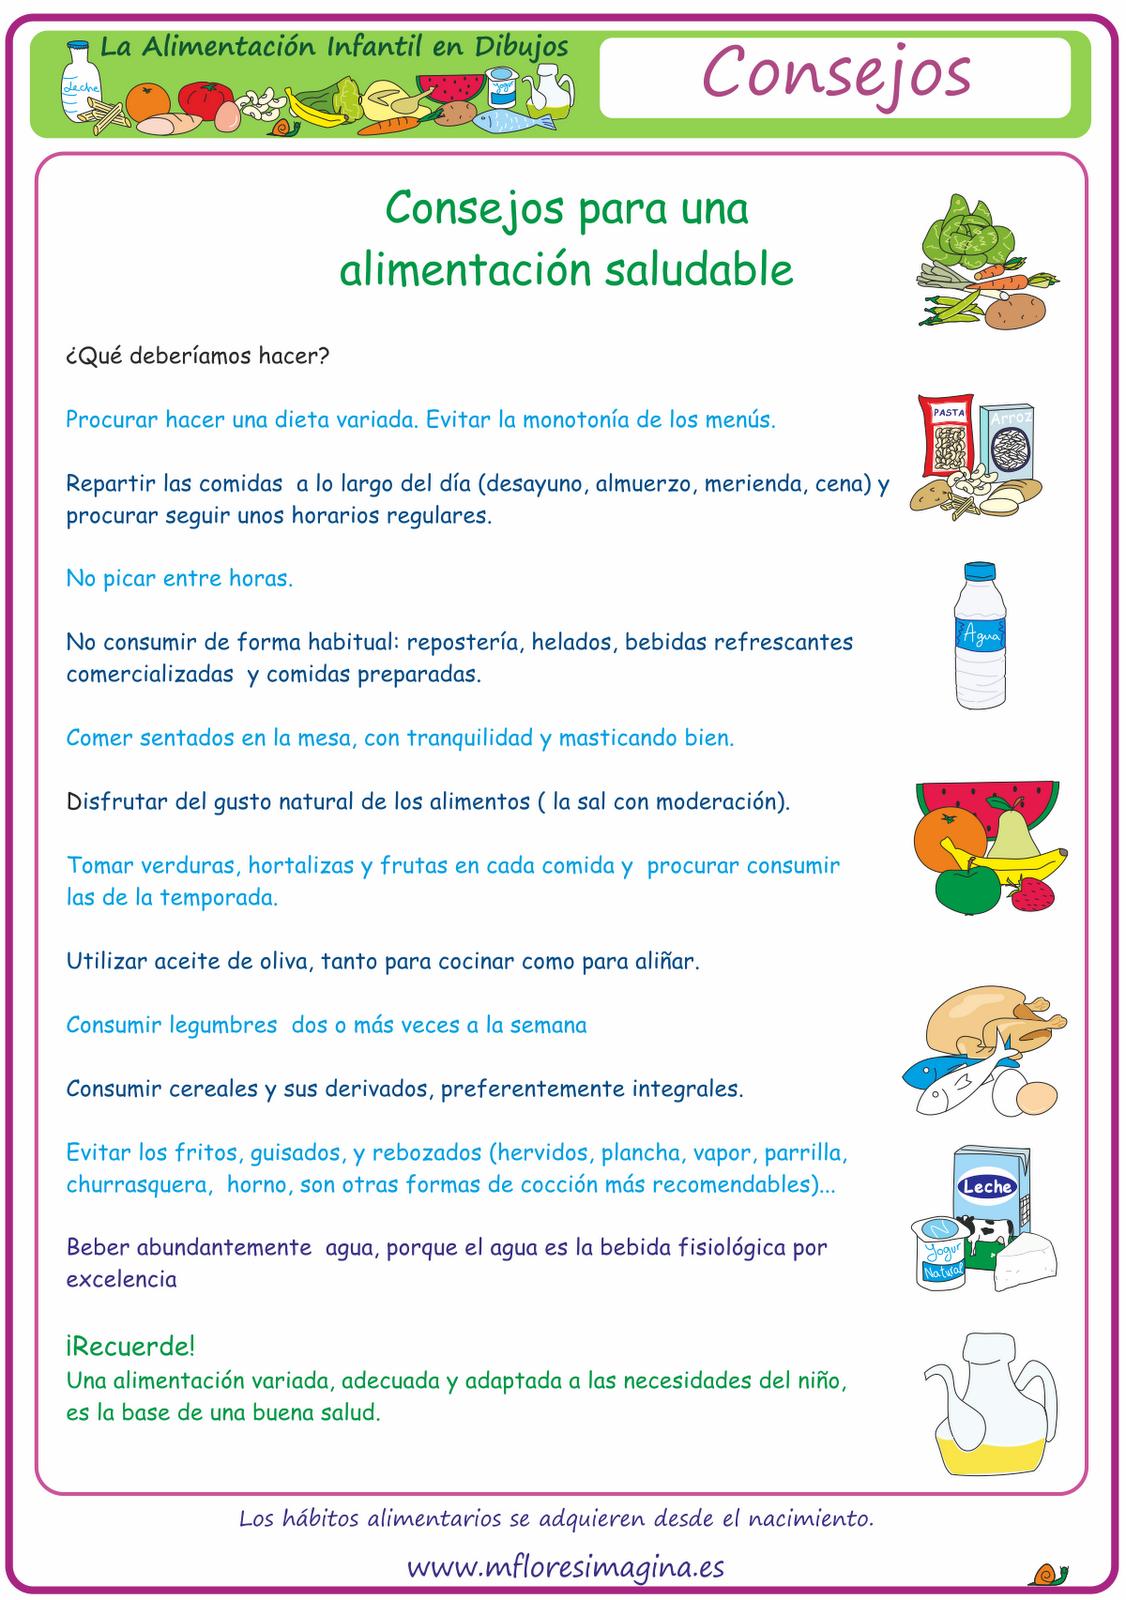 La alimentacin en dibujos Alimentacin saludable